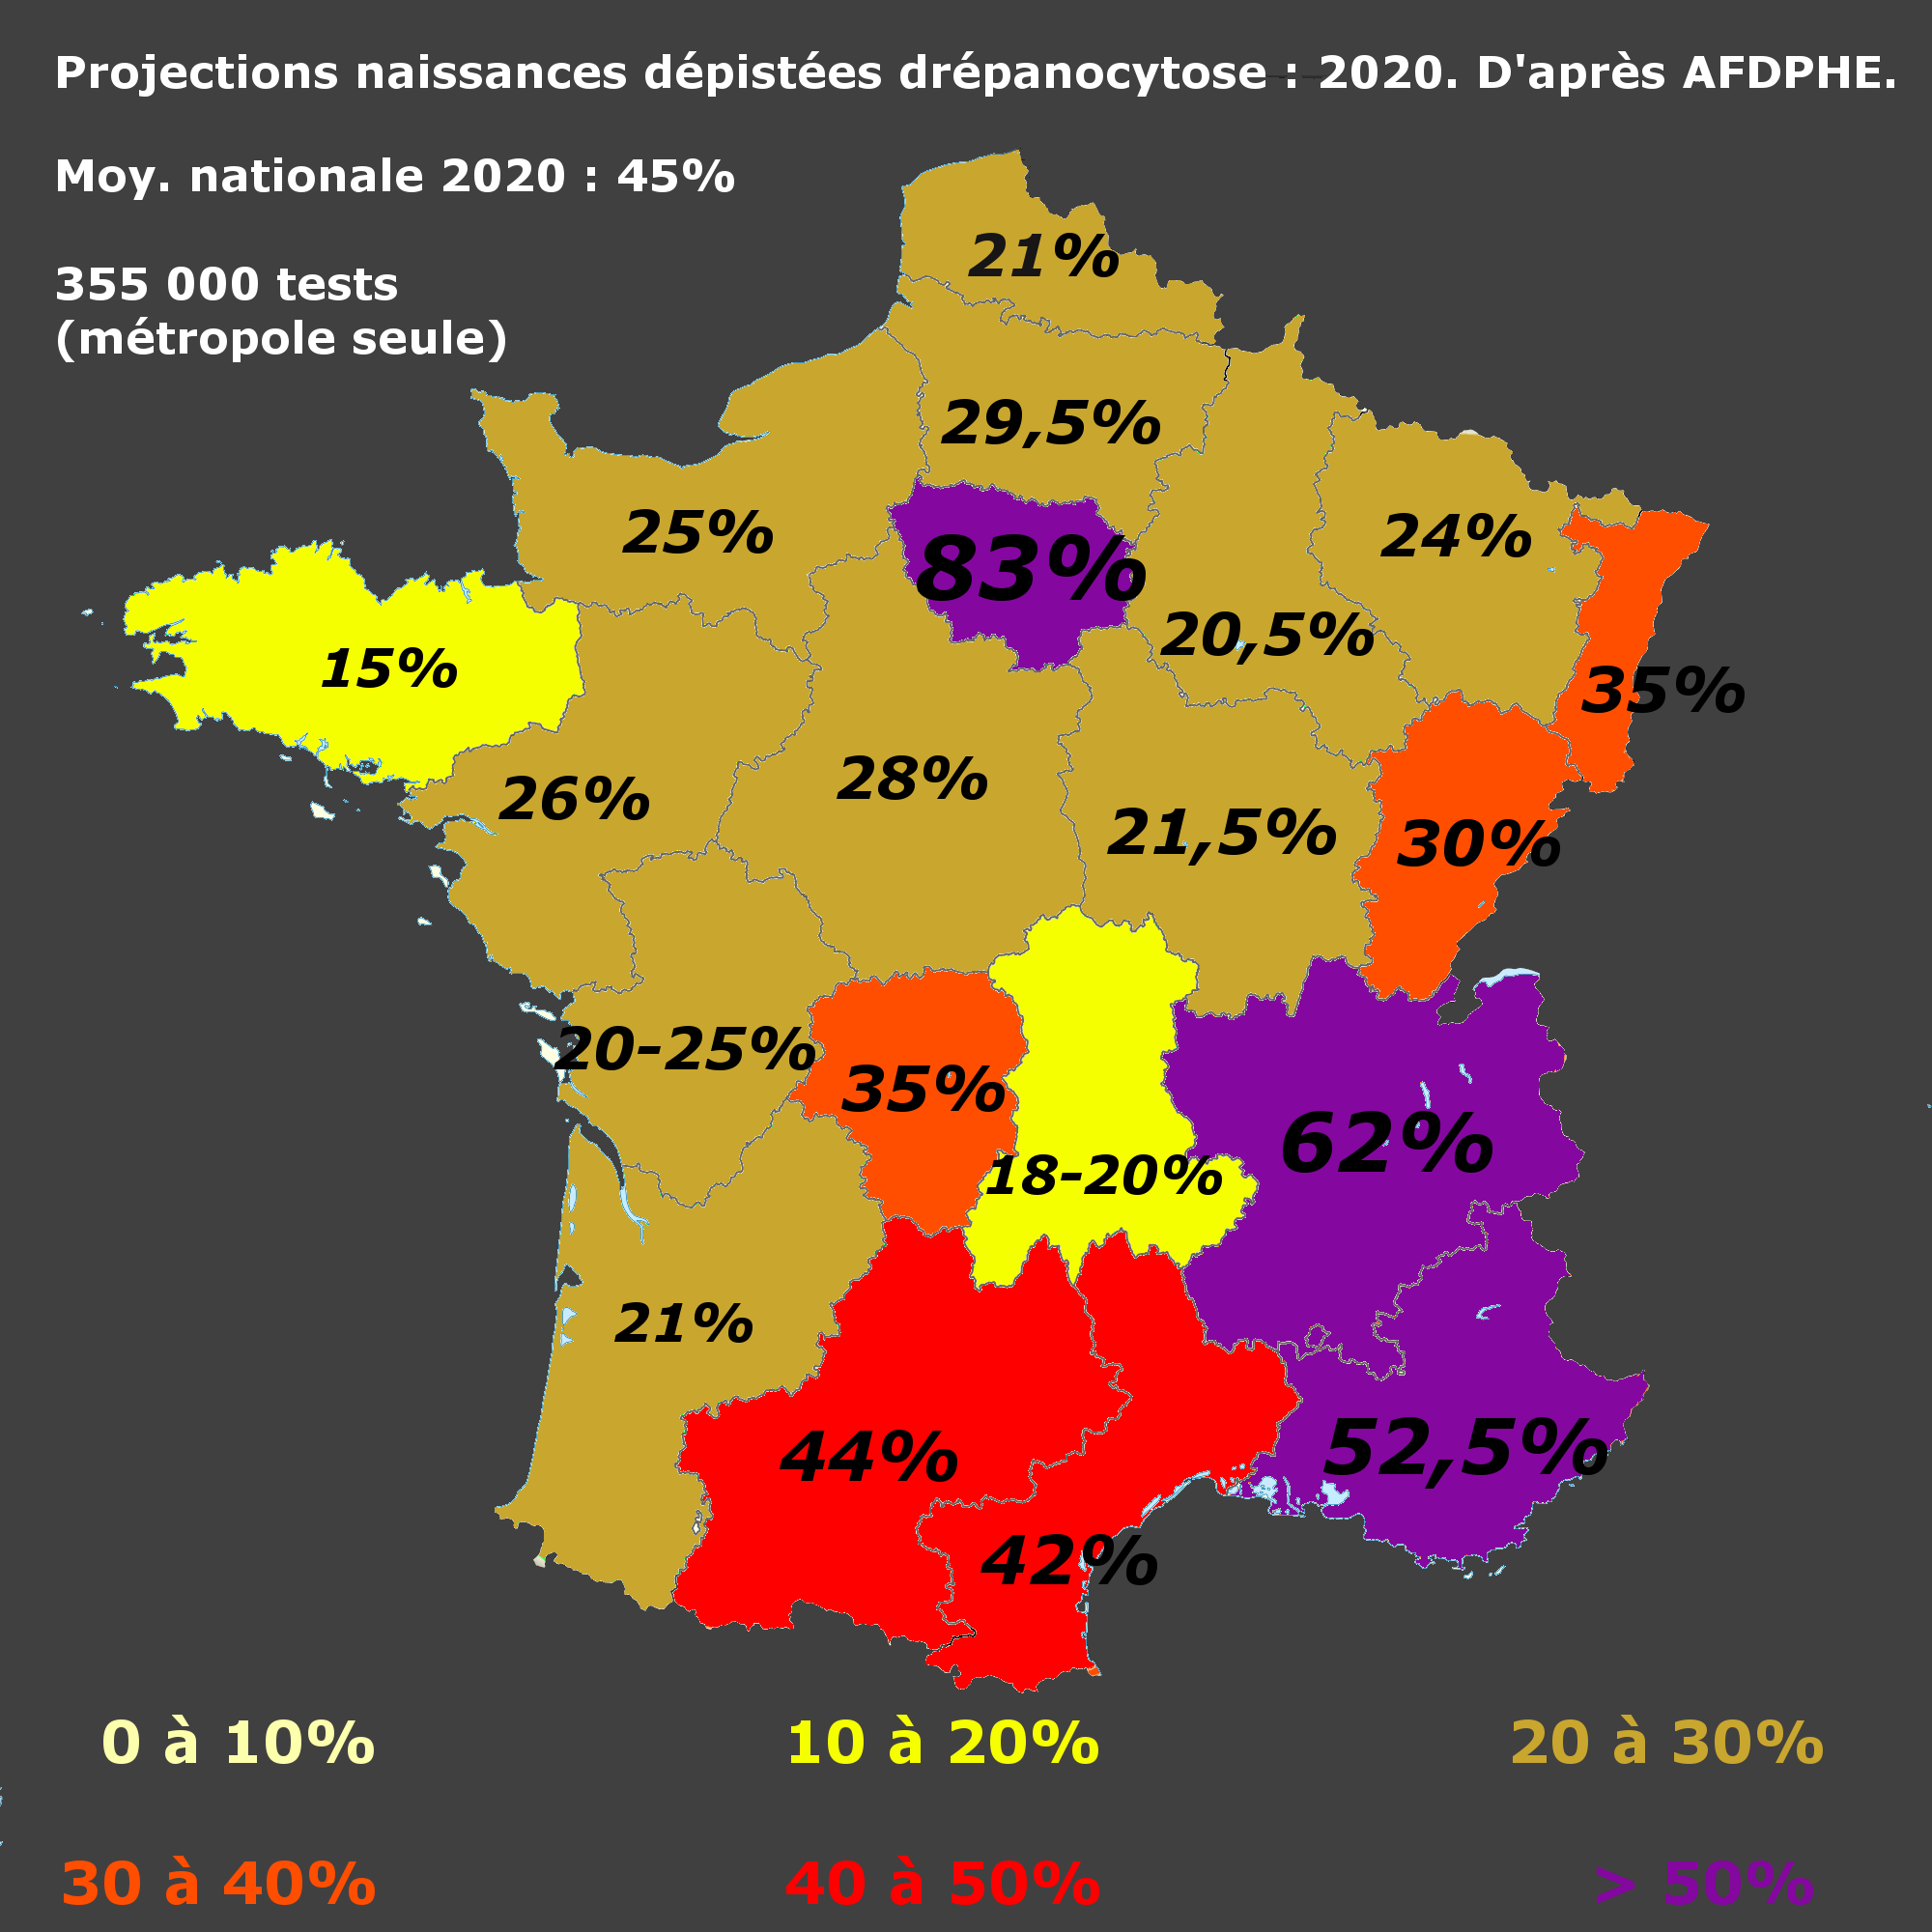 [Image: france_regions_drepano_2020proj1.png]